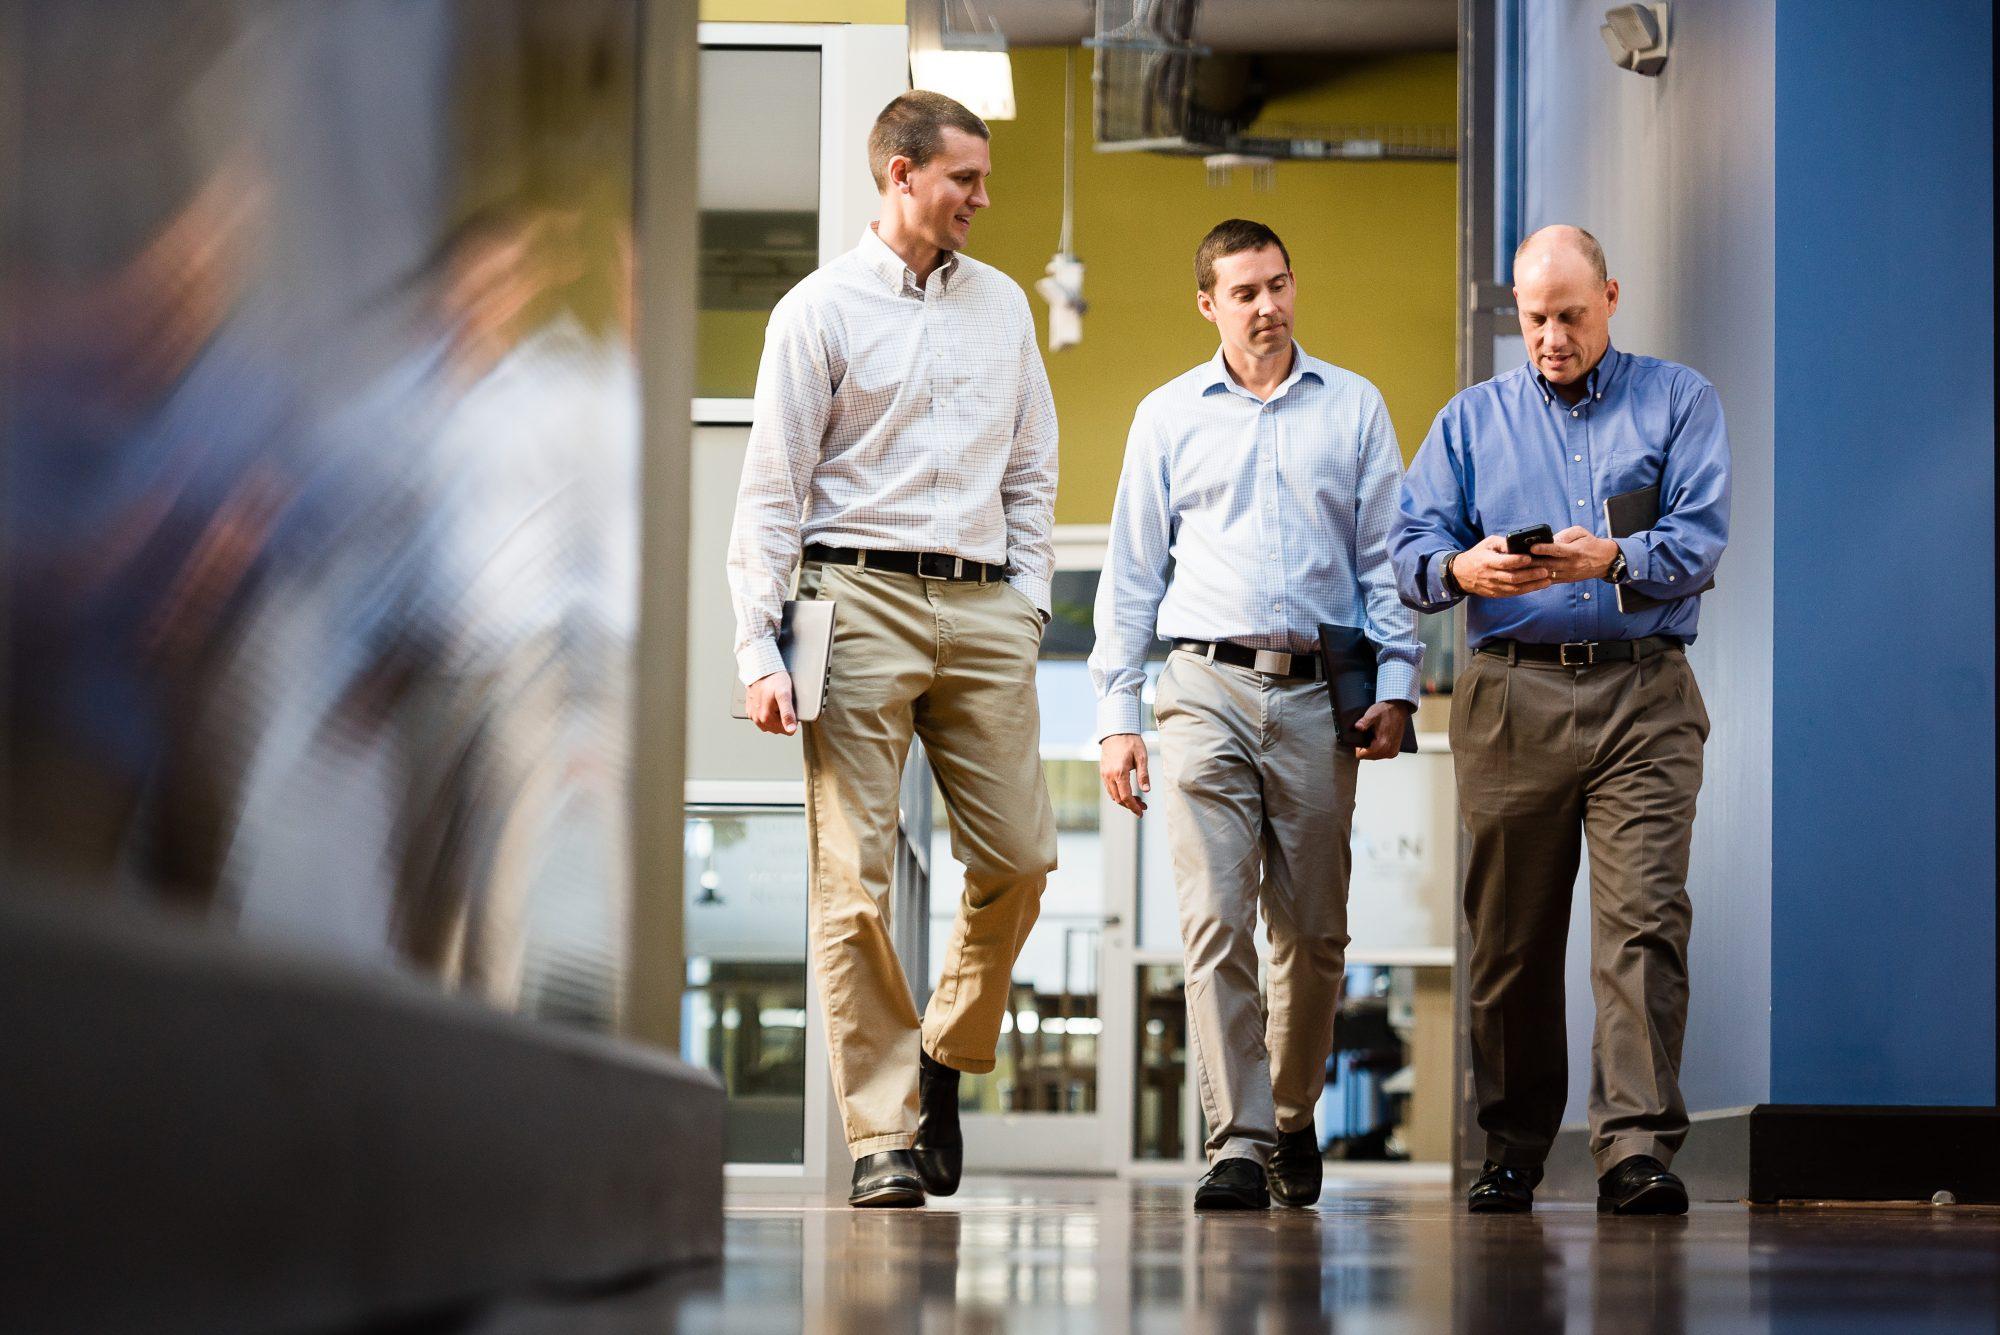 Three men walking down hallway looking at a phone